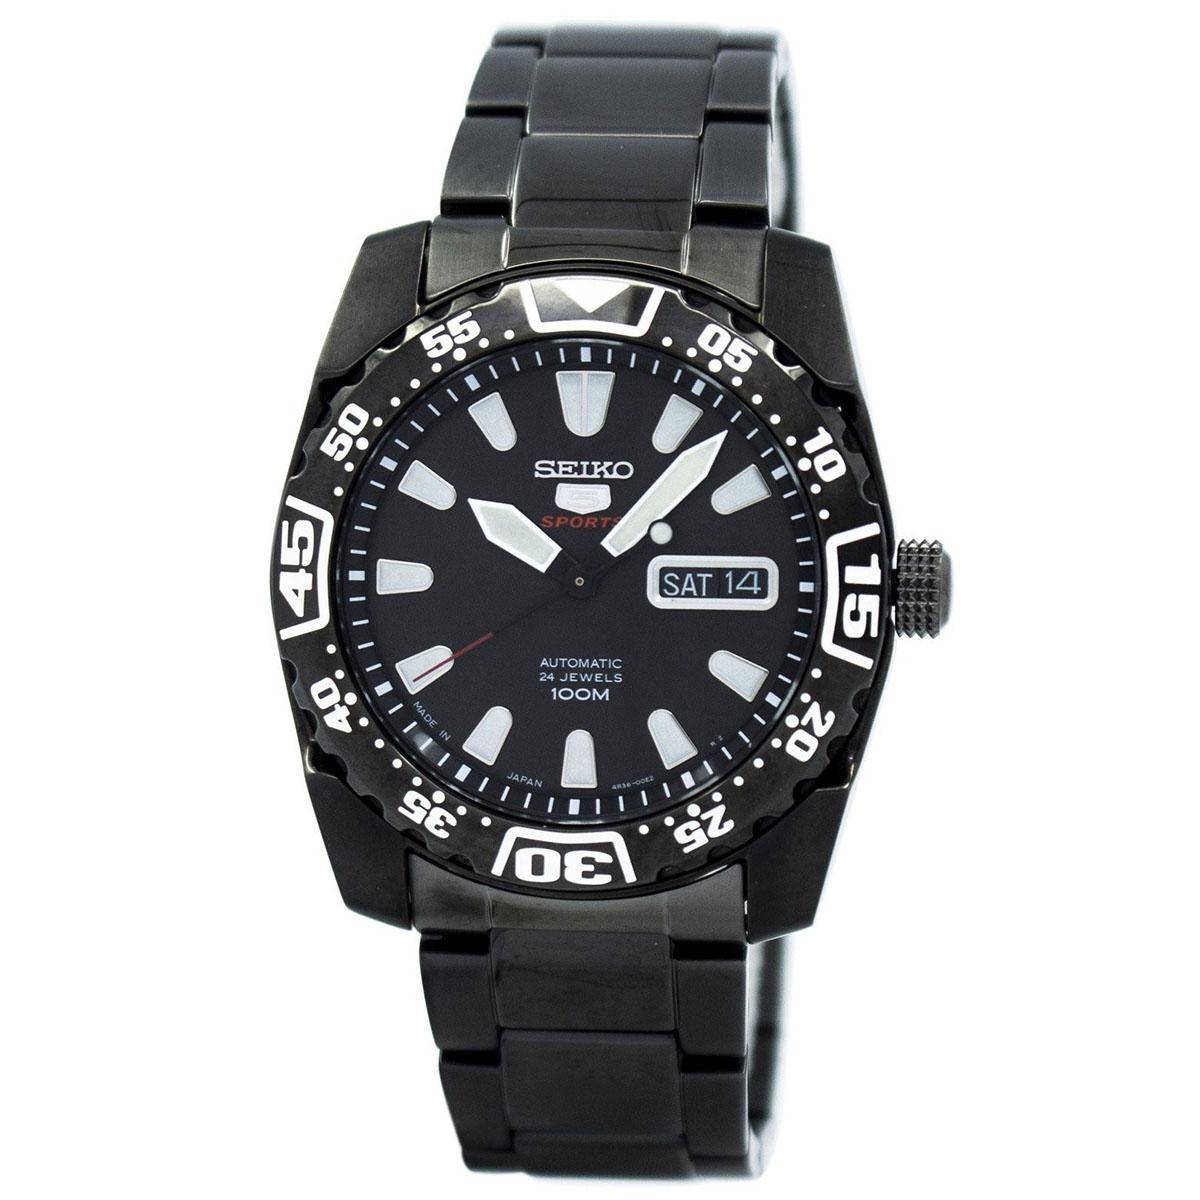 Seiko 5 Sports Black Stainless-Steel Case Stainless-Steel Bracelet Mens JAPAN SRP169J1